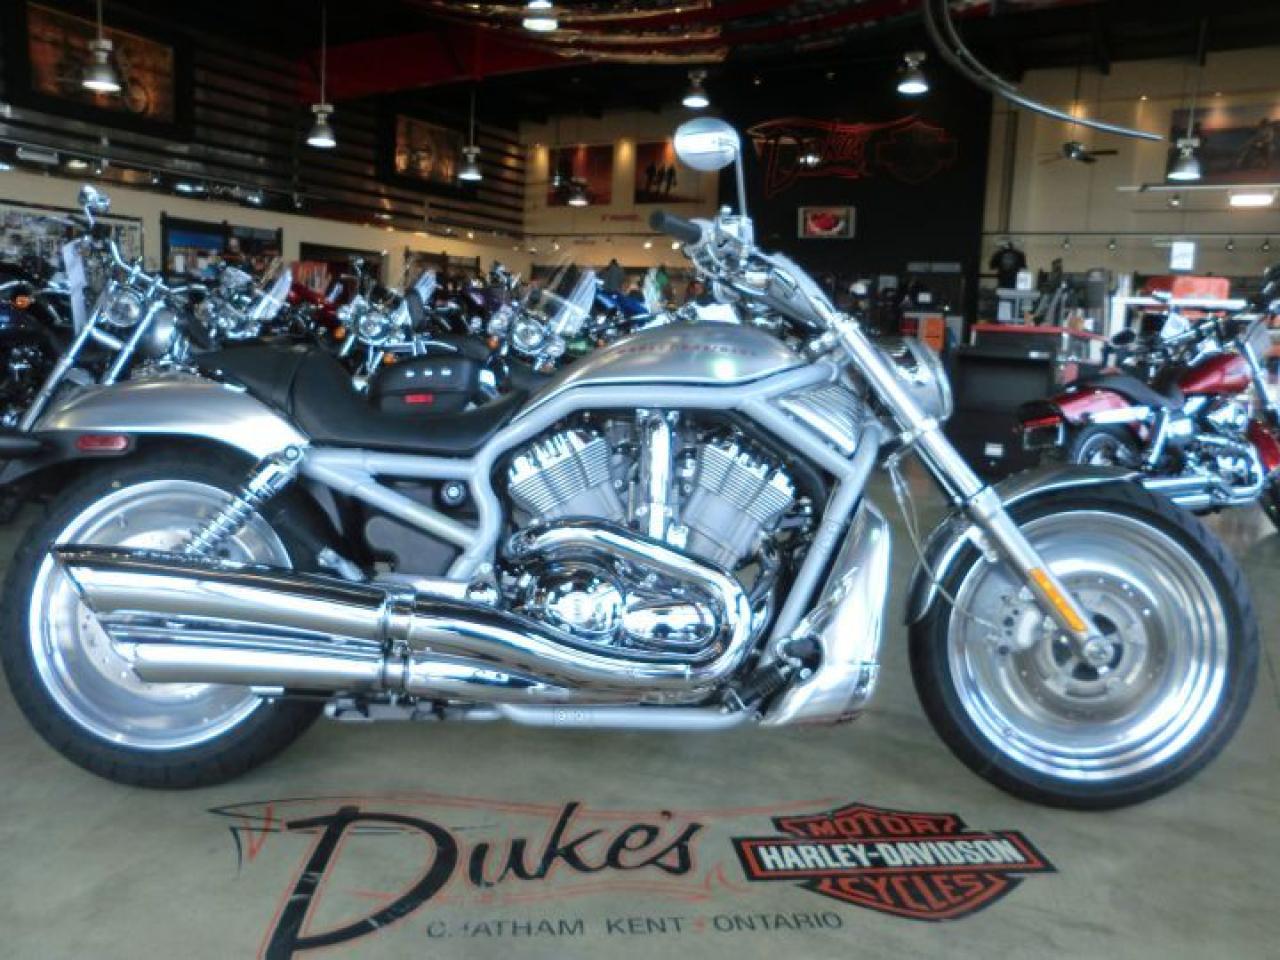 2002 Harley-Davidson V-Rod